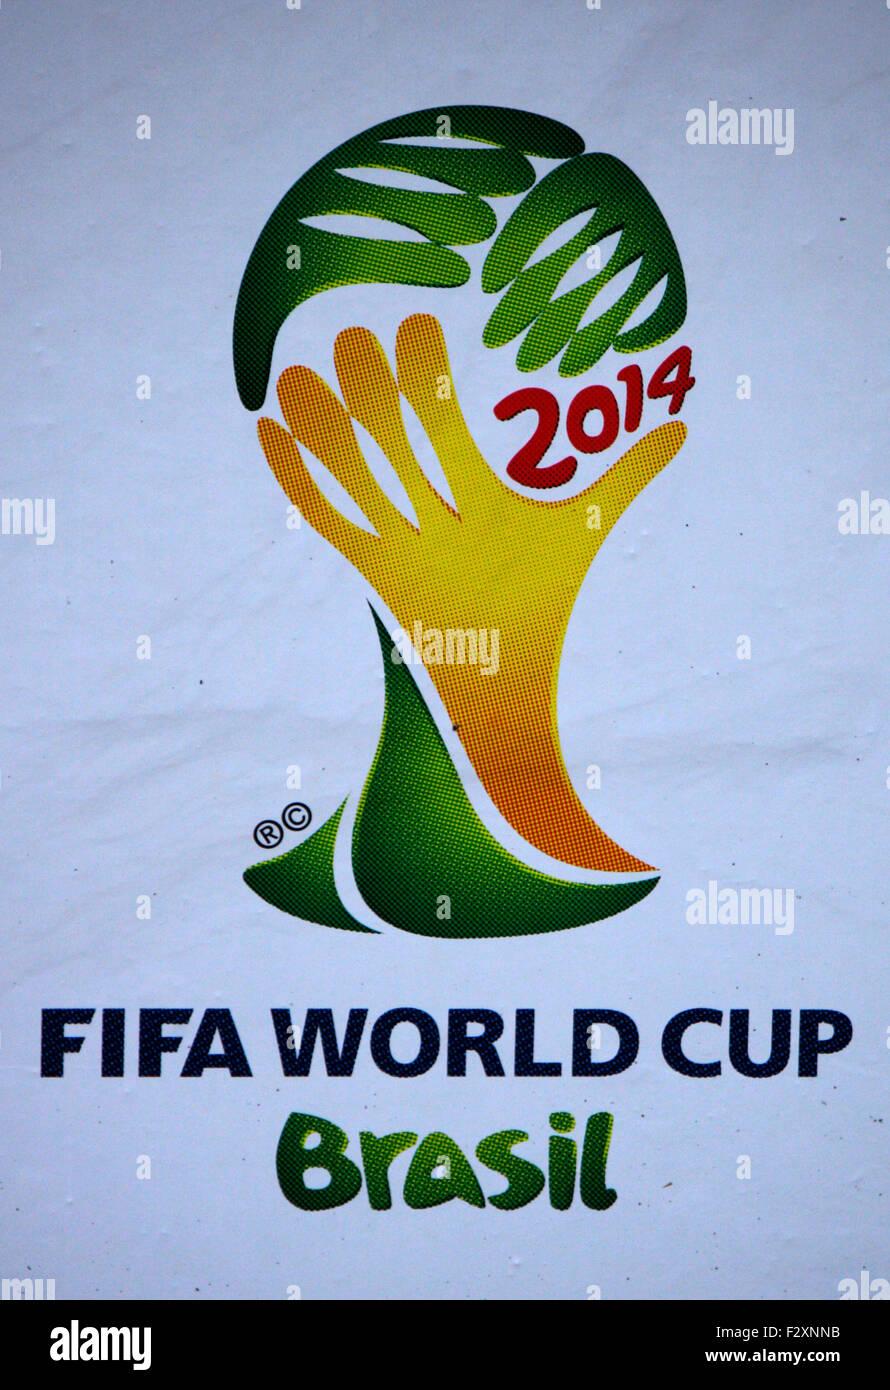 Markenname: 'FIFA World Cup Brasil', Berlin. - Stock Image